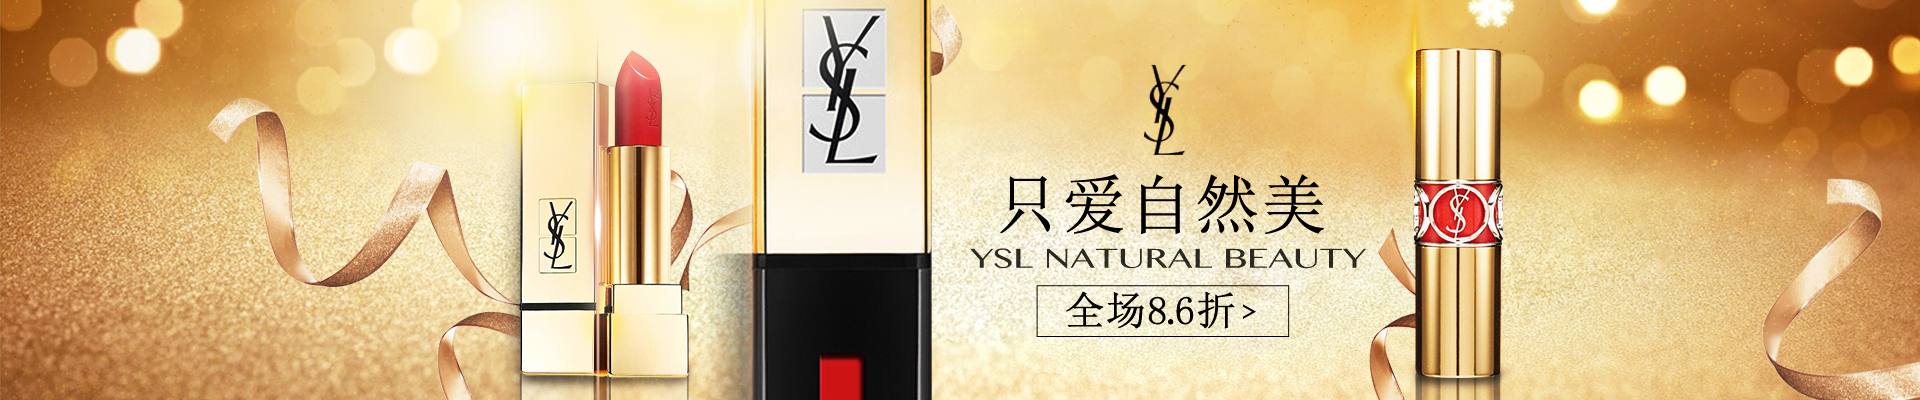 YSL圣罗兰 只爱自然美 全场86折